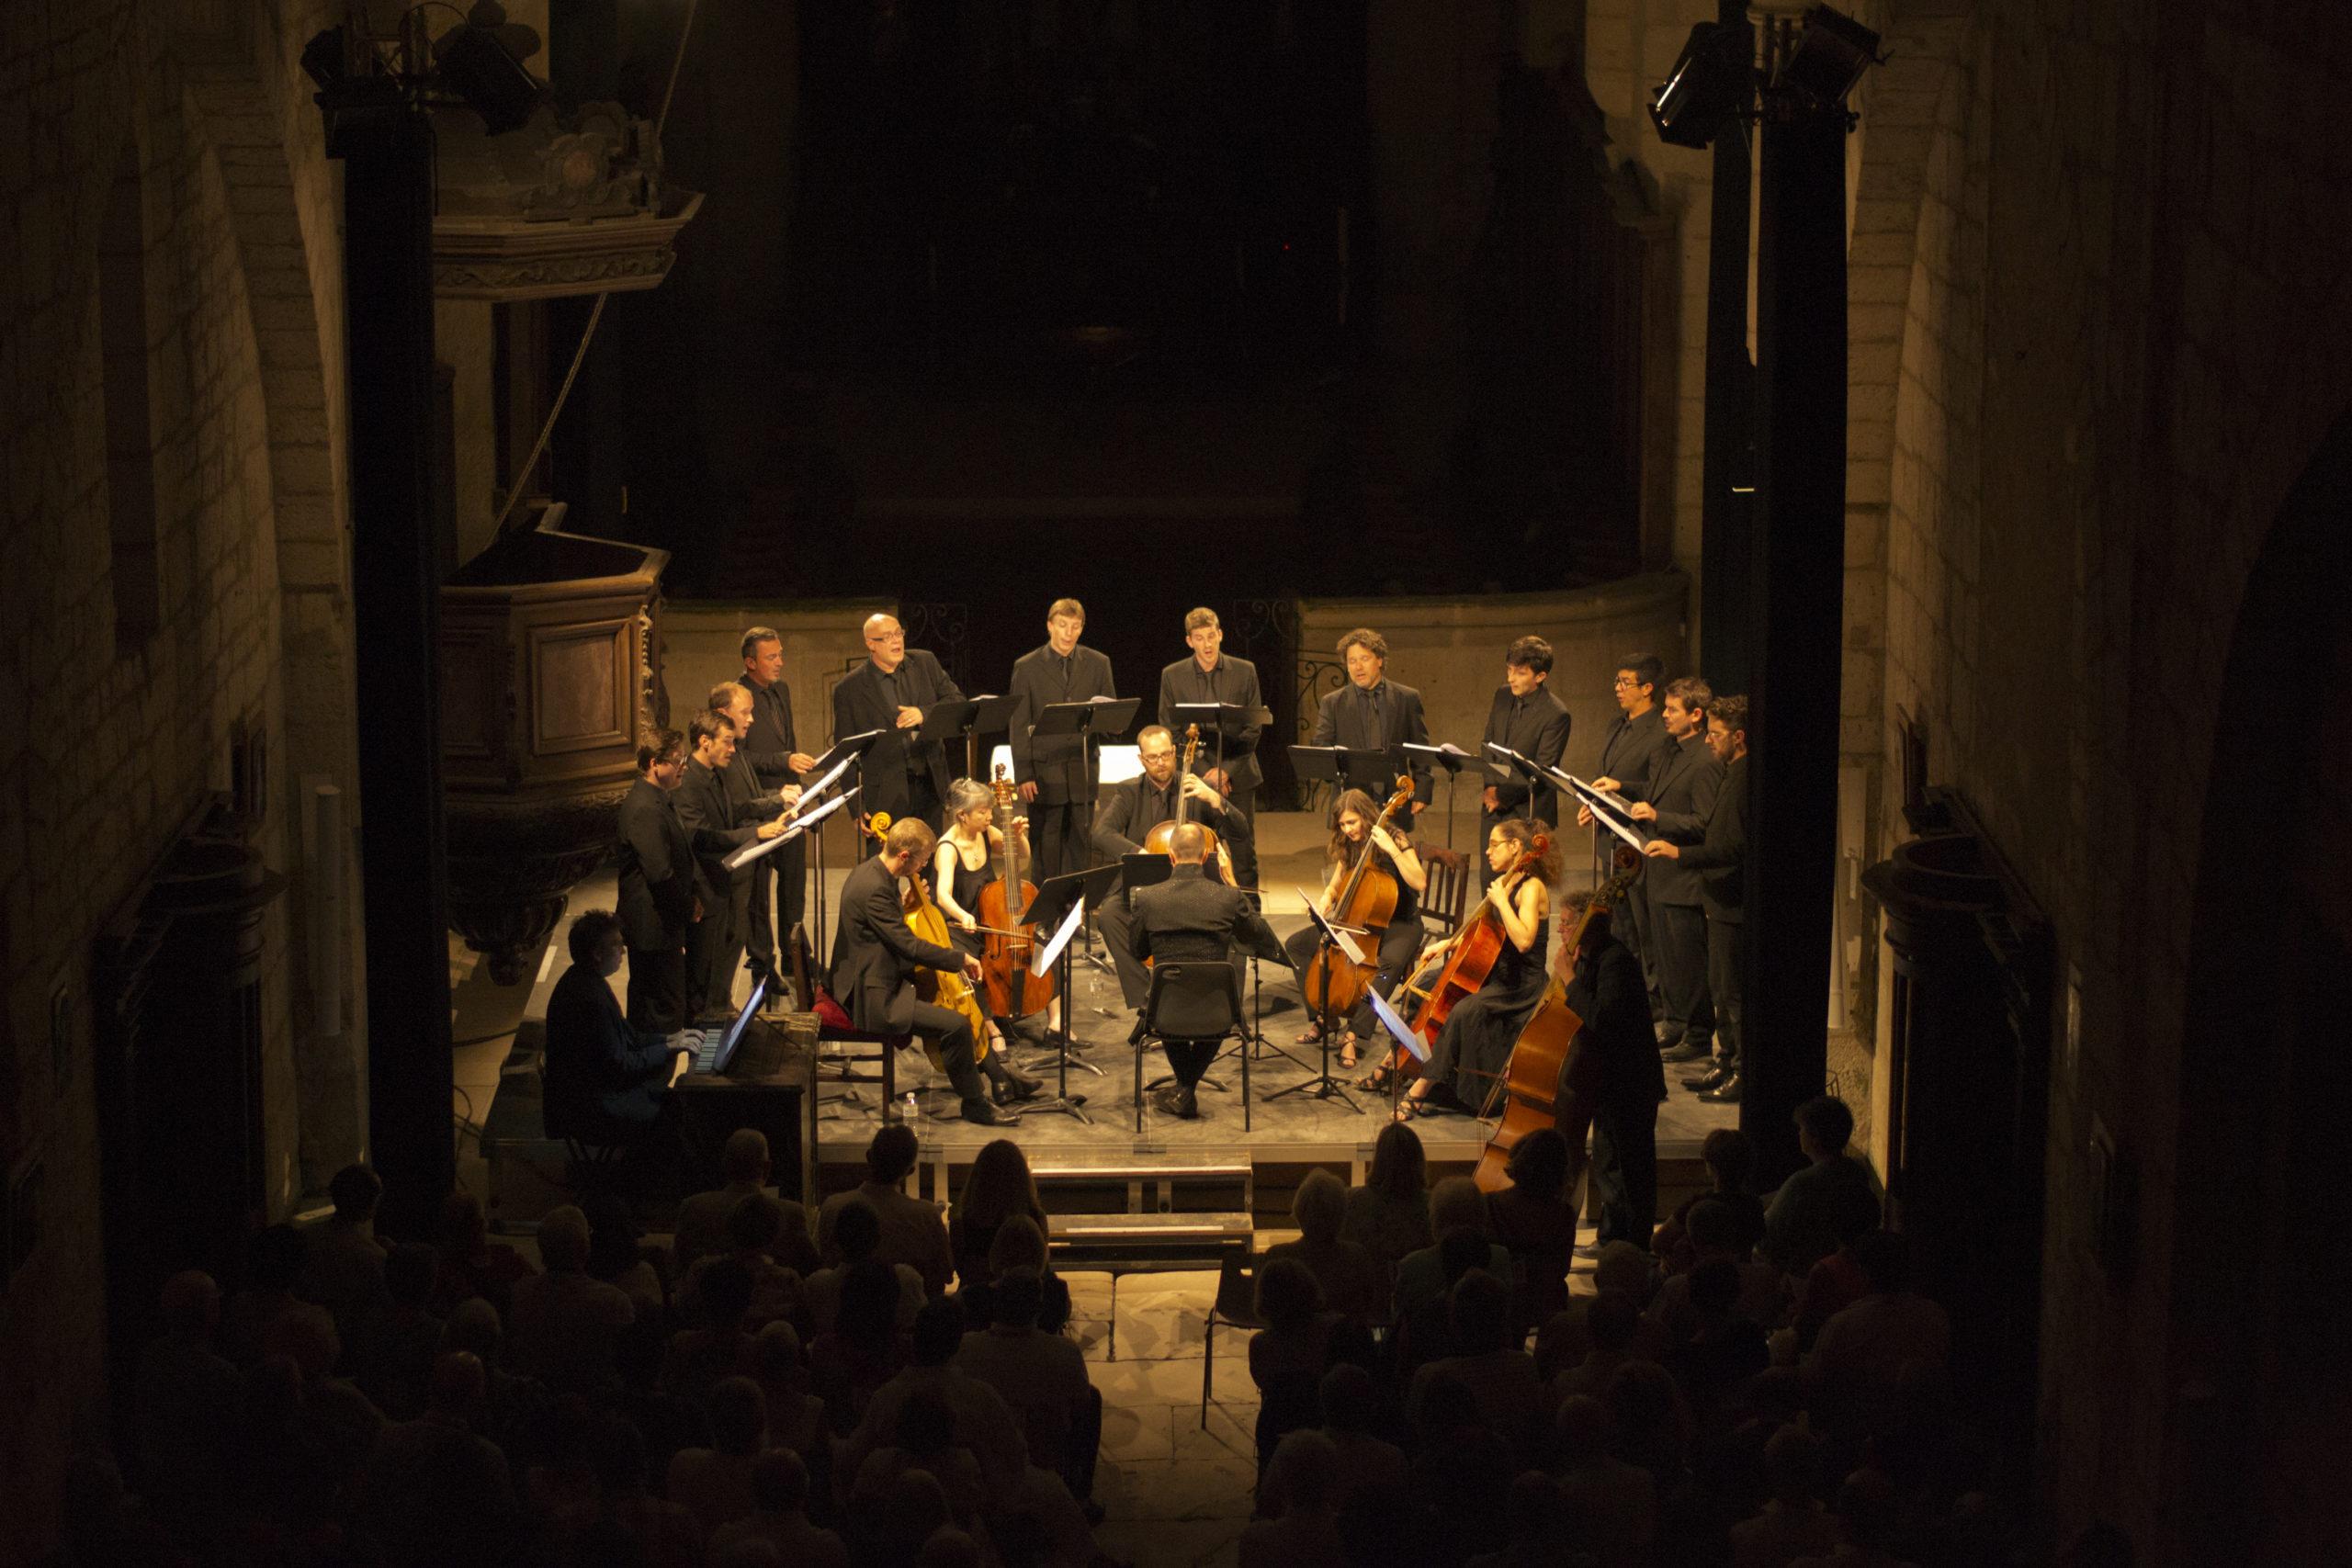 Bouteiller Le Concert Spirituel